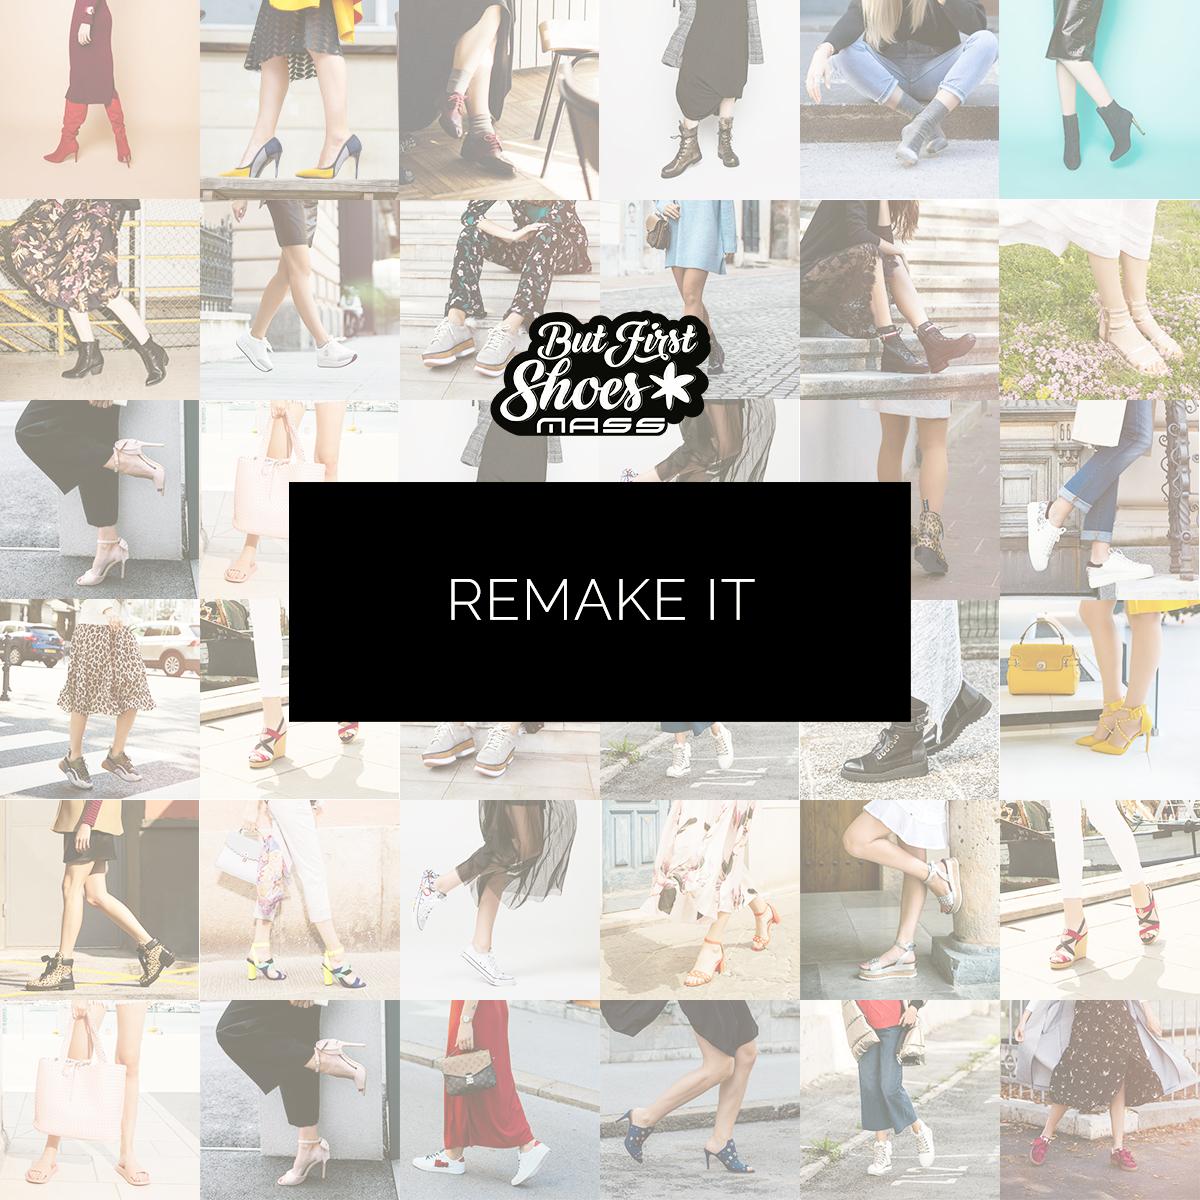 Osvoji nove čevlje z ReMake it!